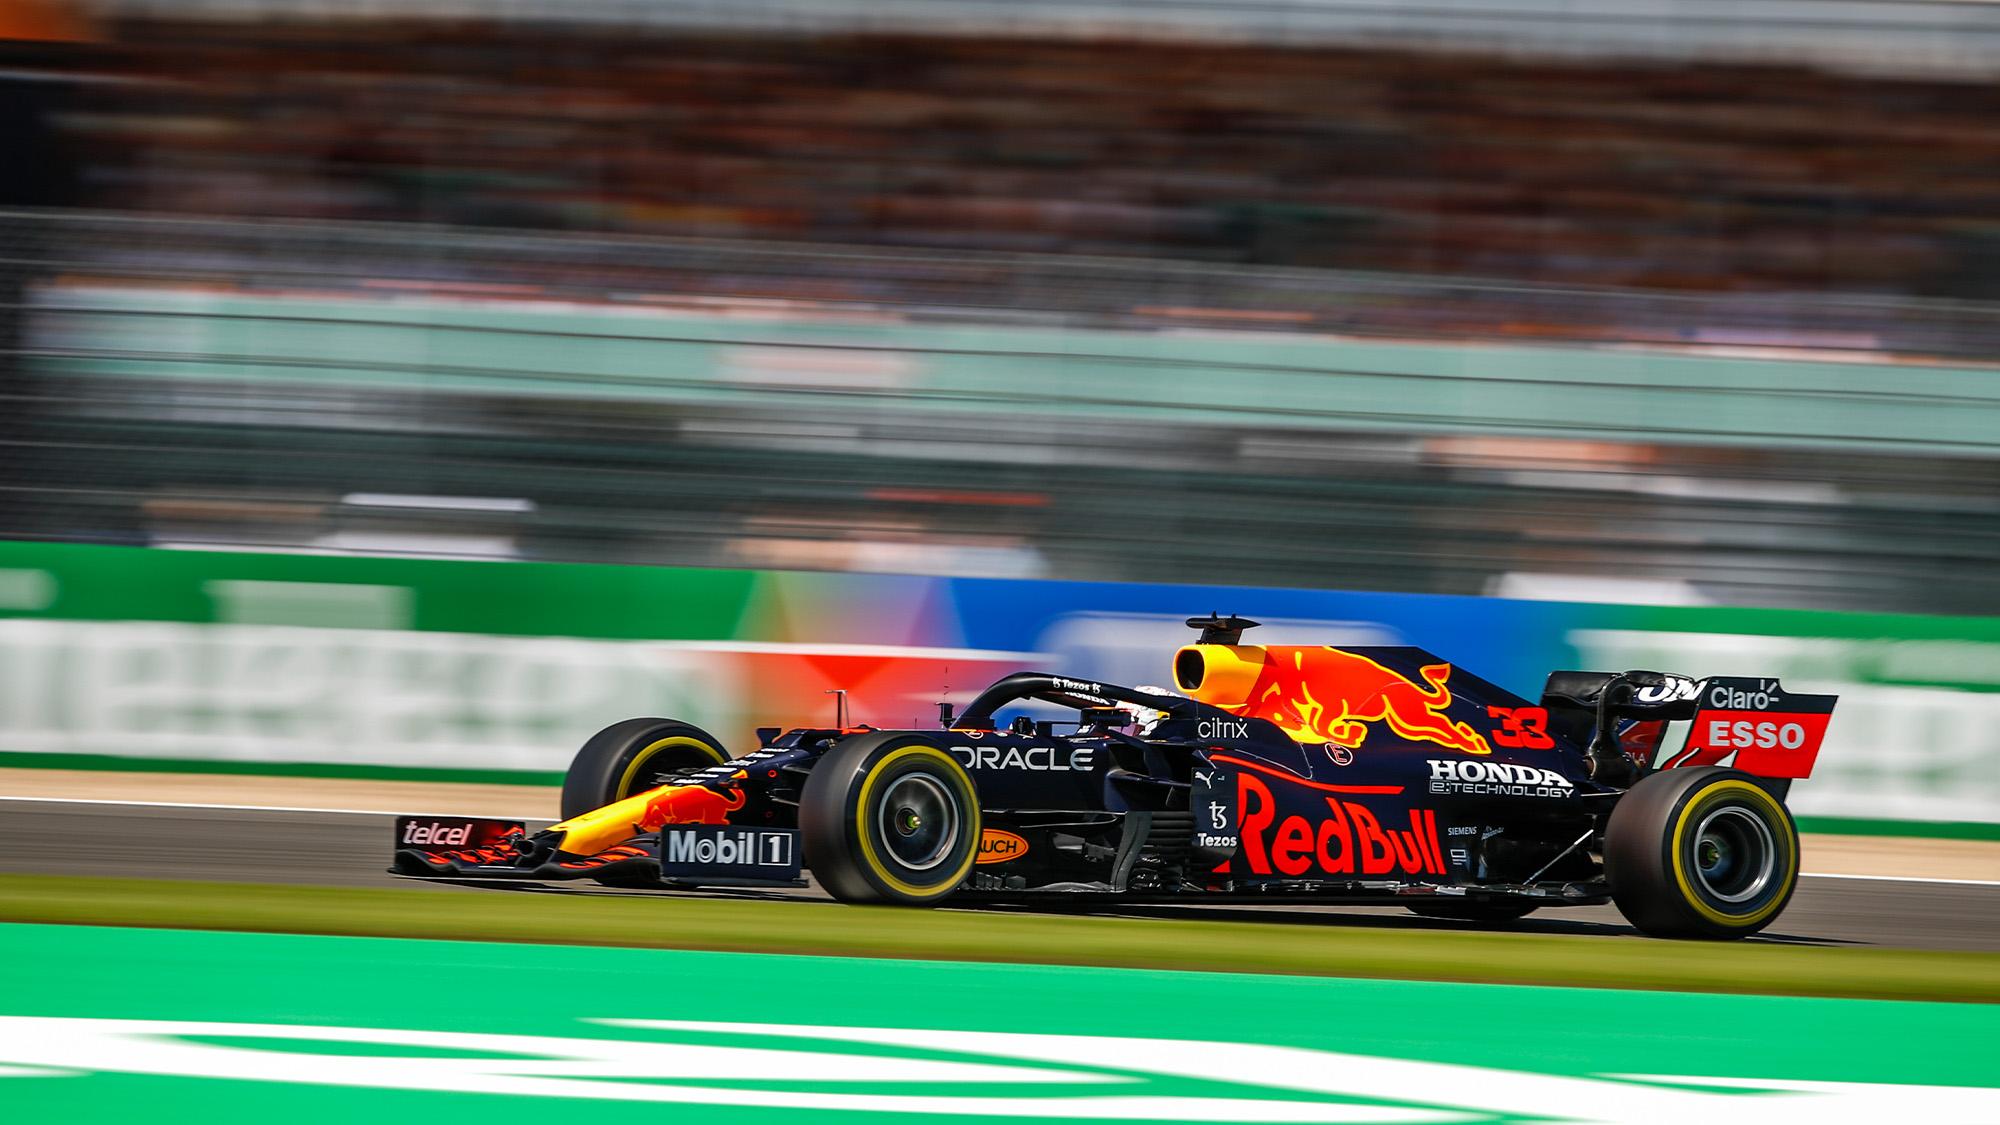 Max Verstappen in 2021 British Grand Prix sprint race